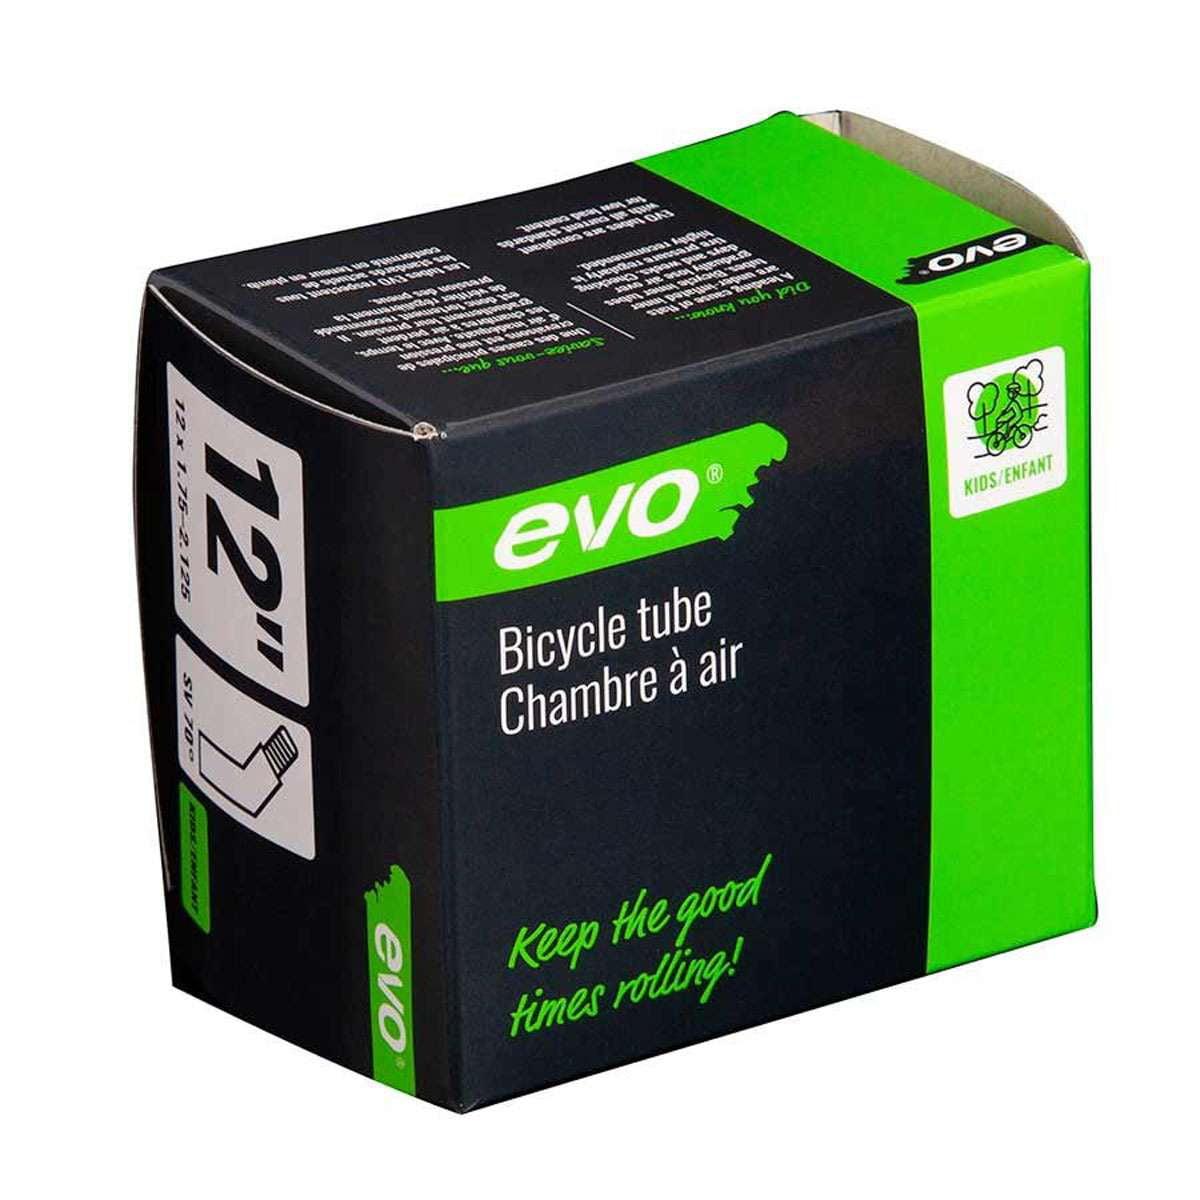 Evo Bicycle Tube - Schrader, 70 , Length: 35mm, 12', 1.75-2.125 - 14EV.020176-02